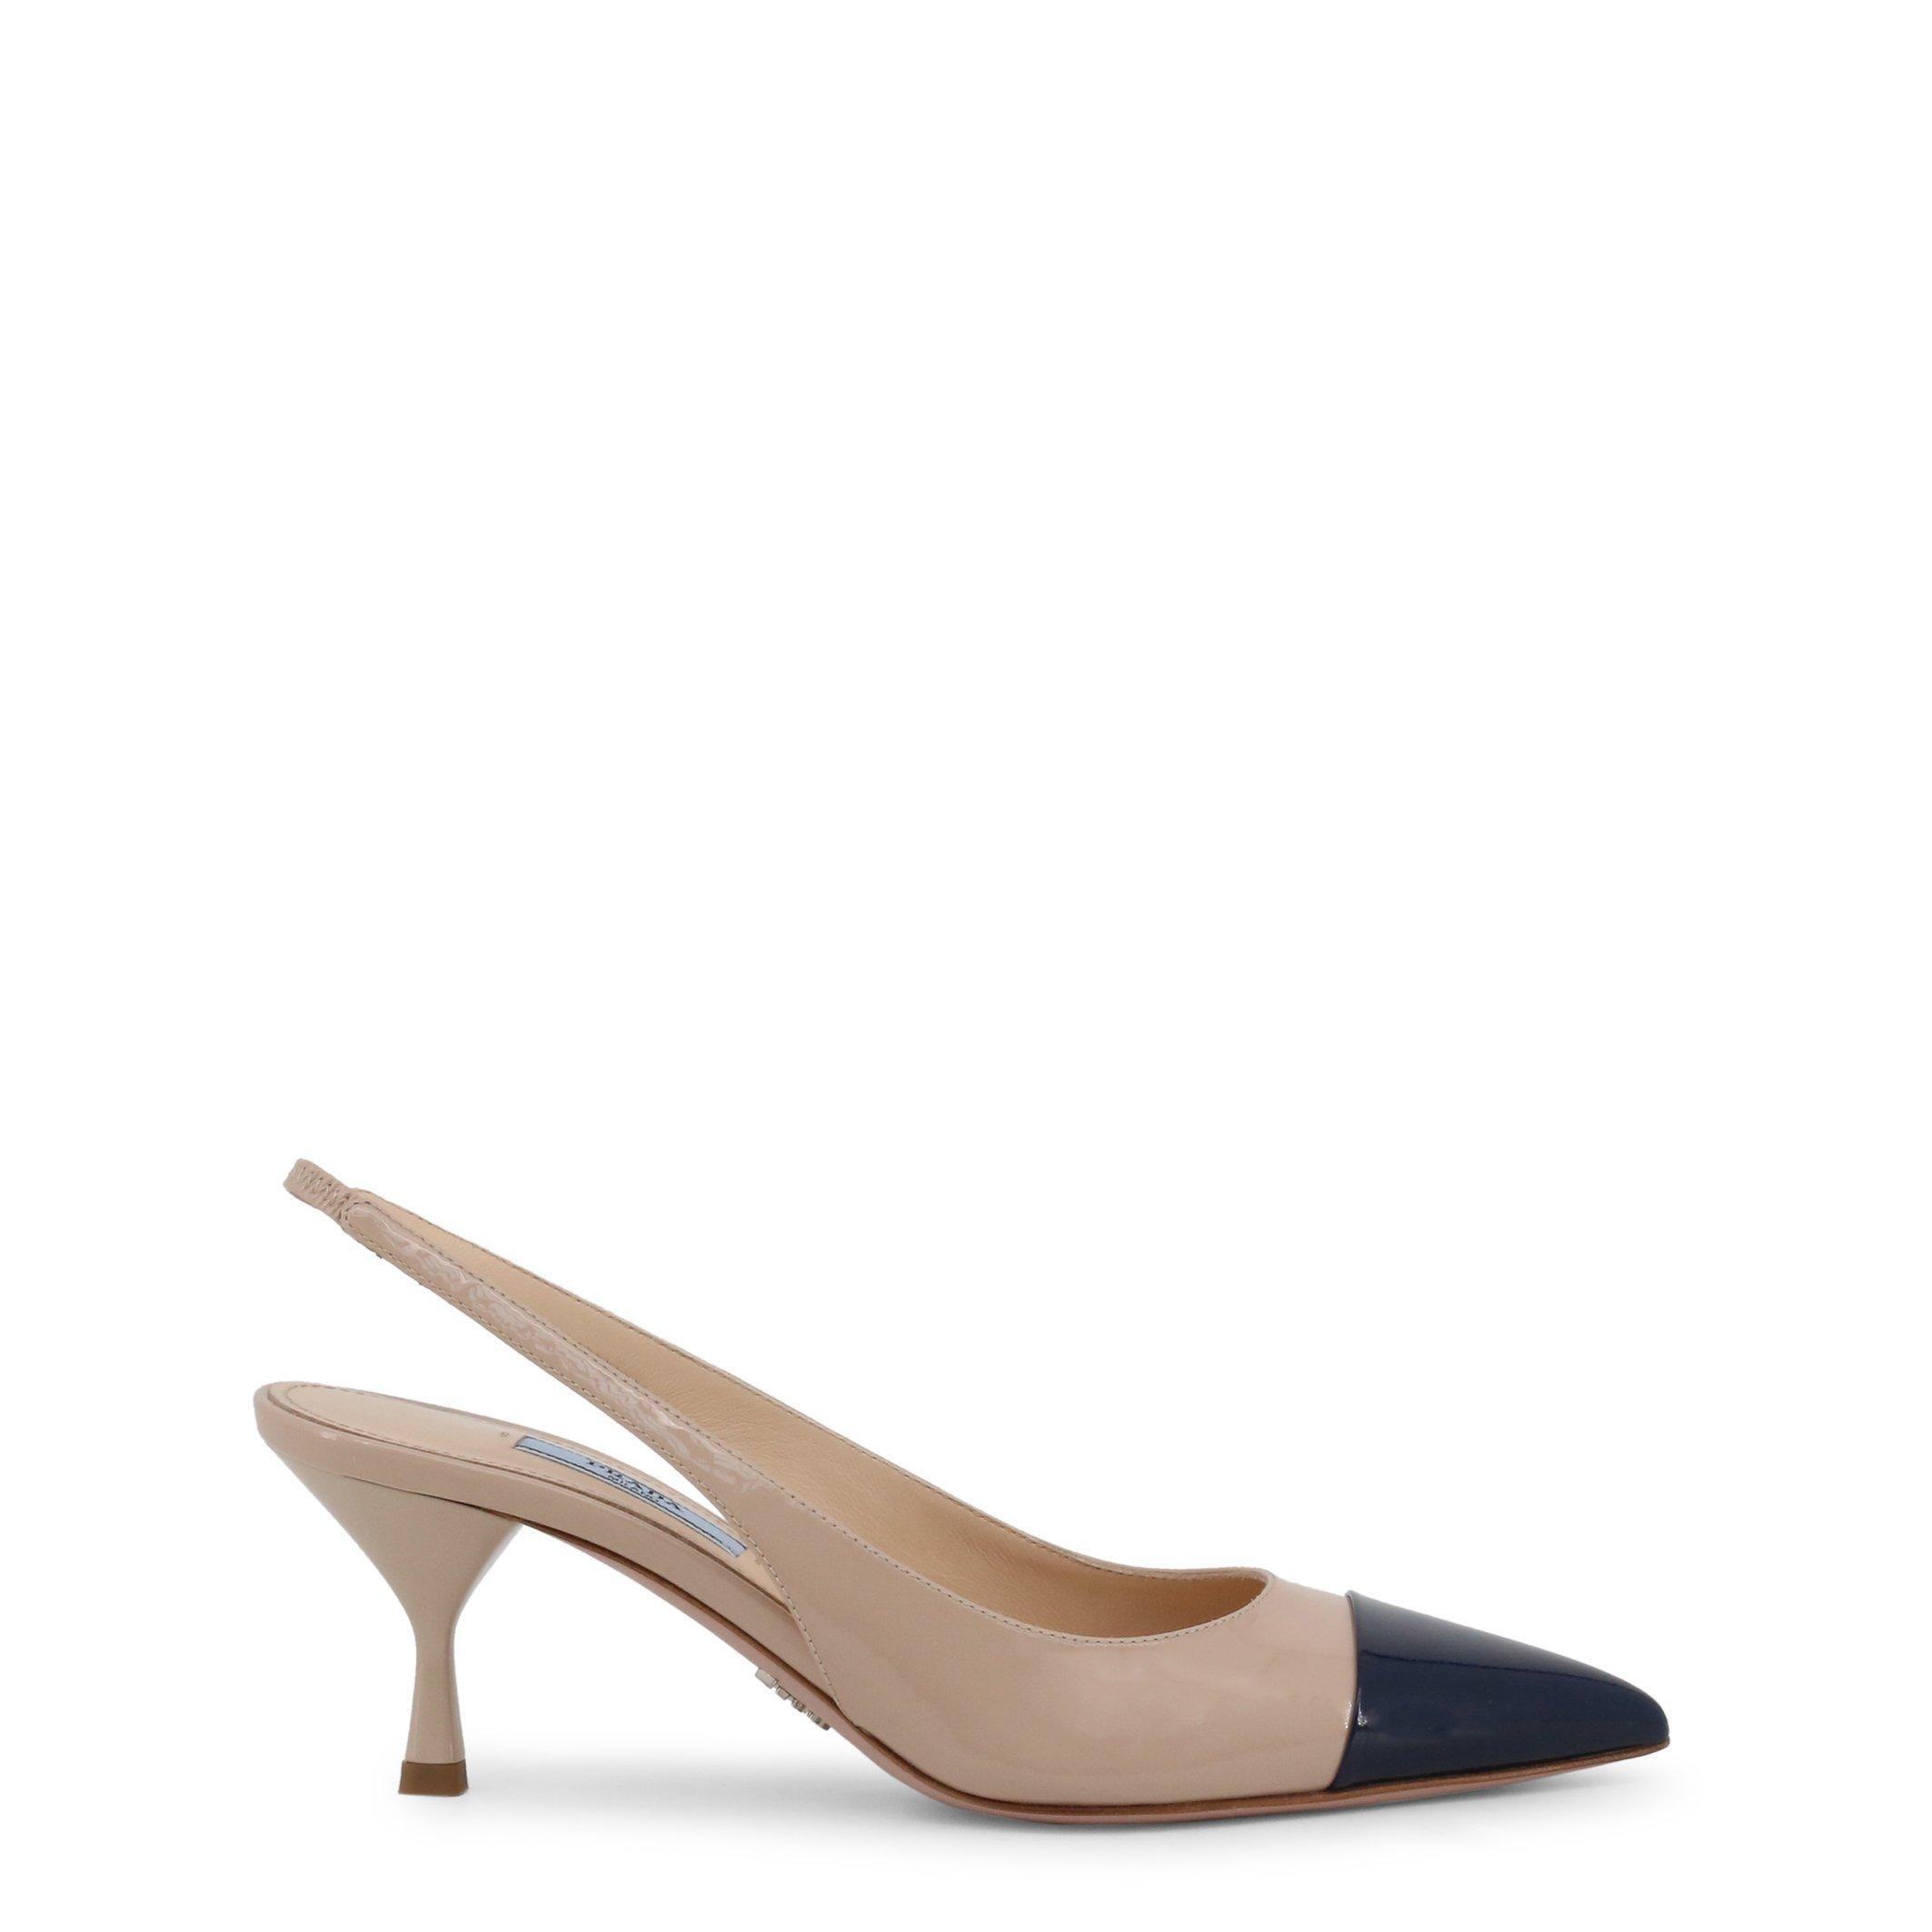 Prada Women's Heels Brown 1I272L - brown-1 37 EU